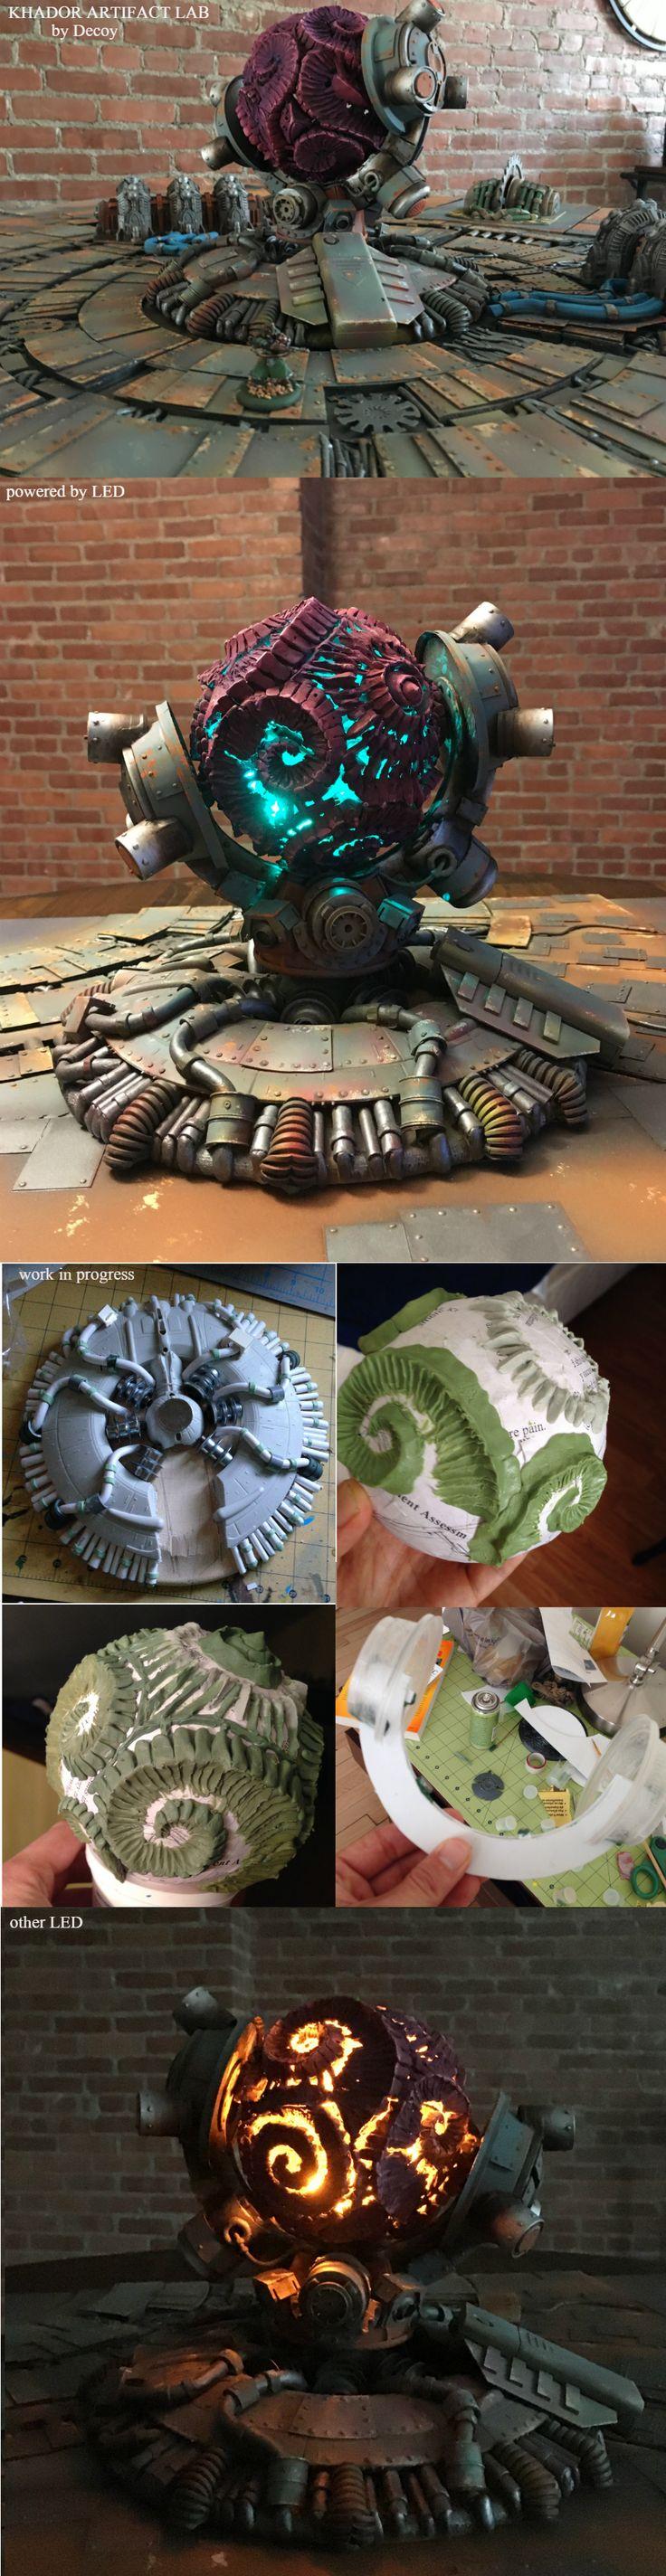 Chulthu artifact laboratory - steampunk terrain 4 by 4 feet - Forum - DakkaDakka | I see lead people.